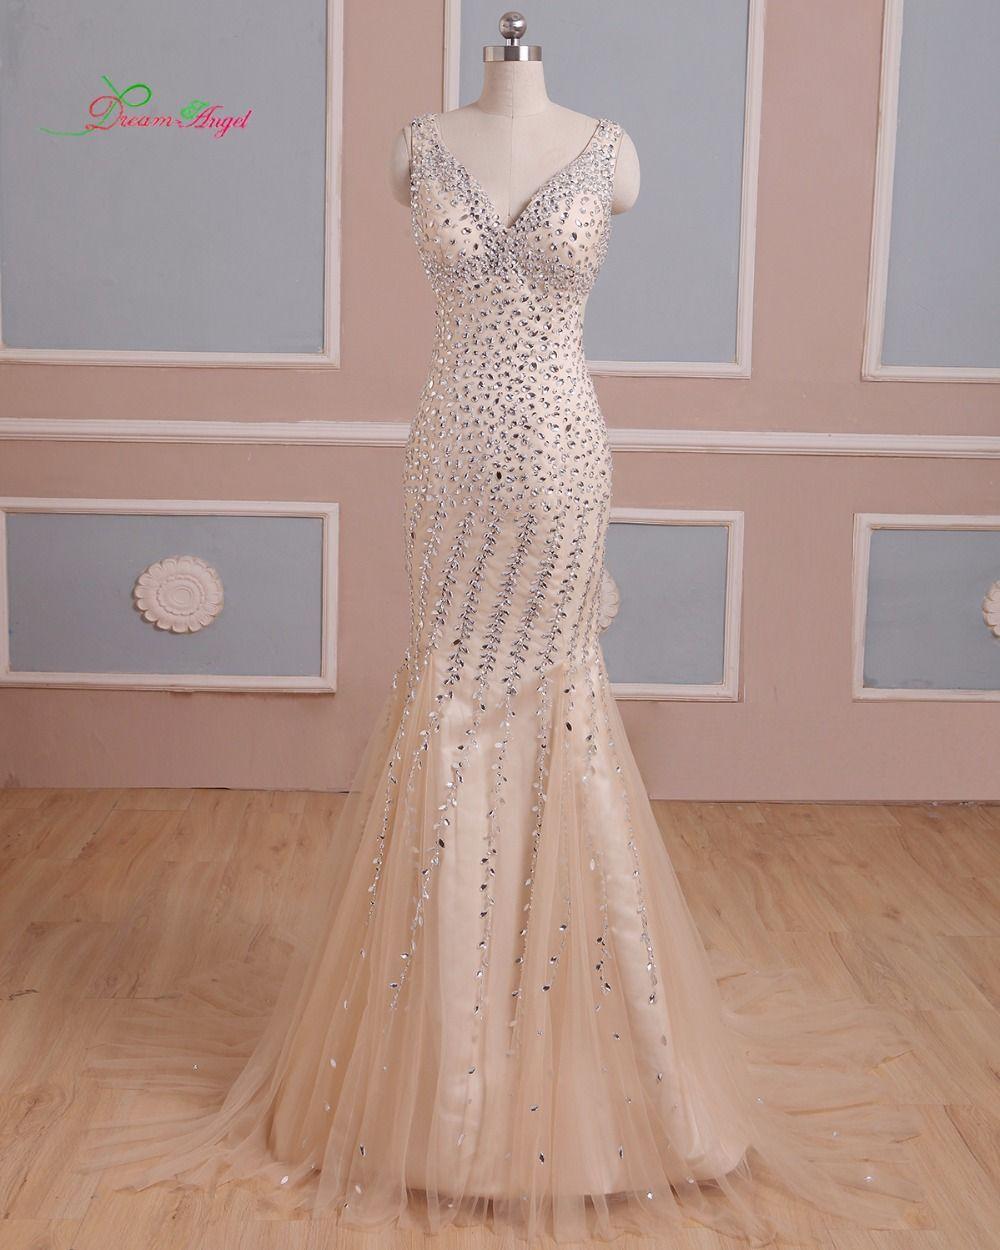 Click to buy ucuc dream angel elegant v neck long mermaid prom dresses